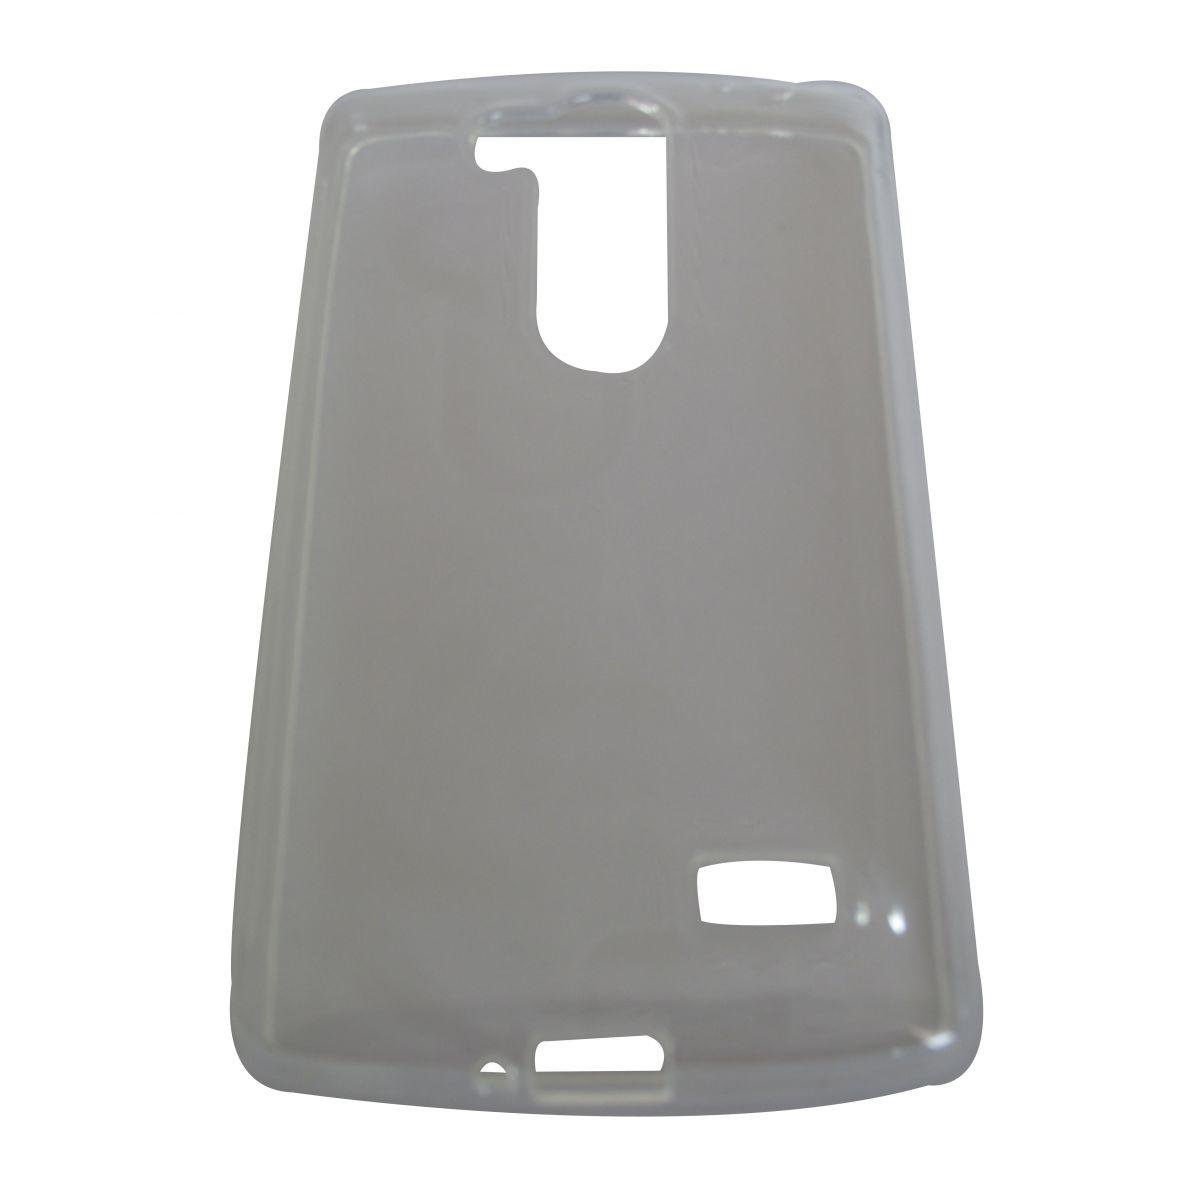 Capa TPU Transparente LG G2 Lite D295